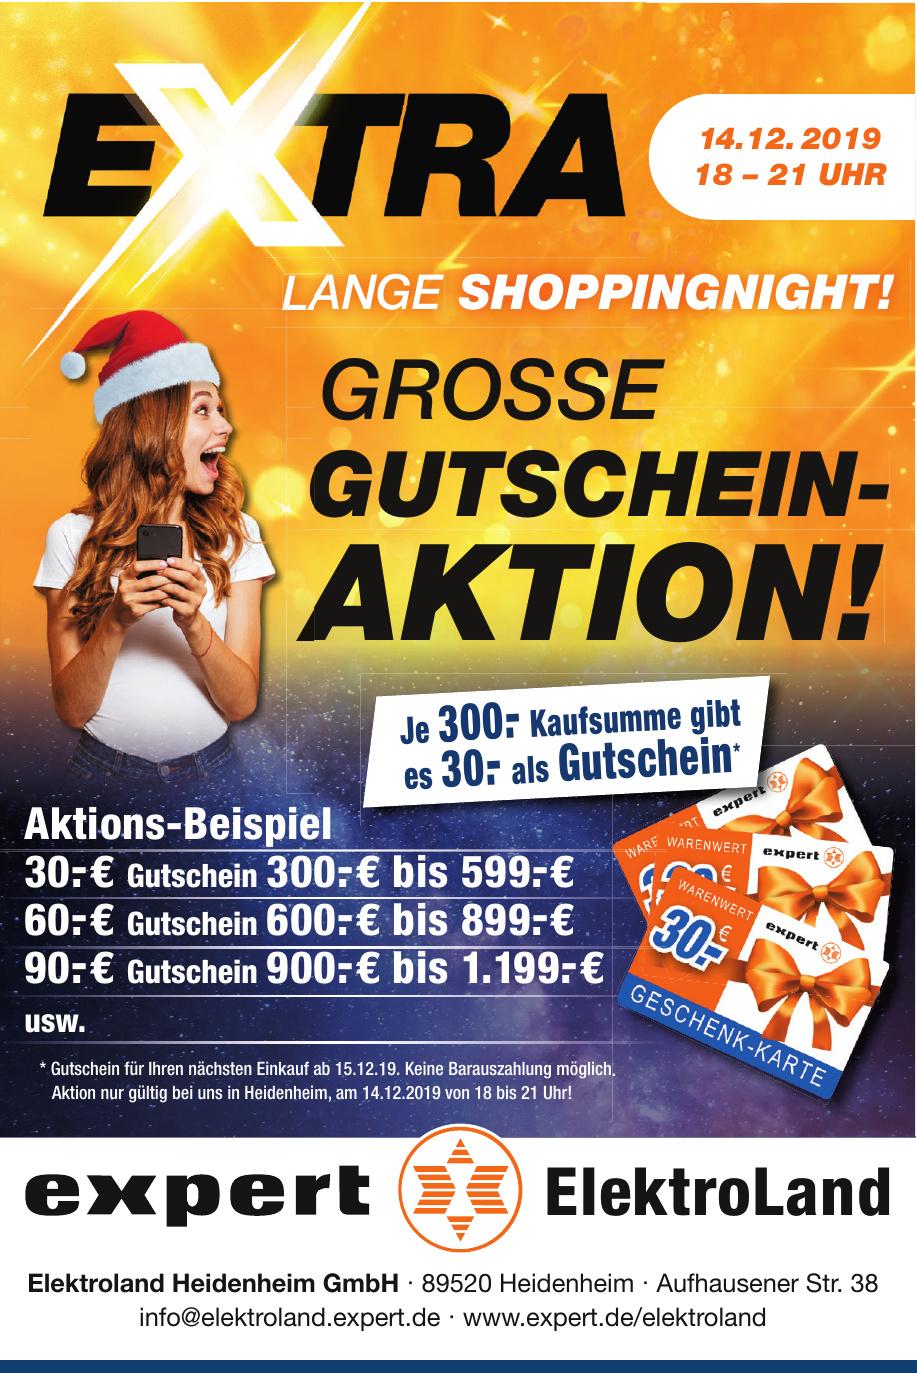 Elektroland Heidenheim GmbH